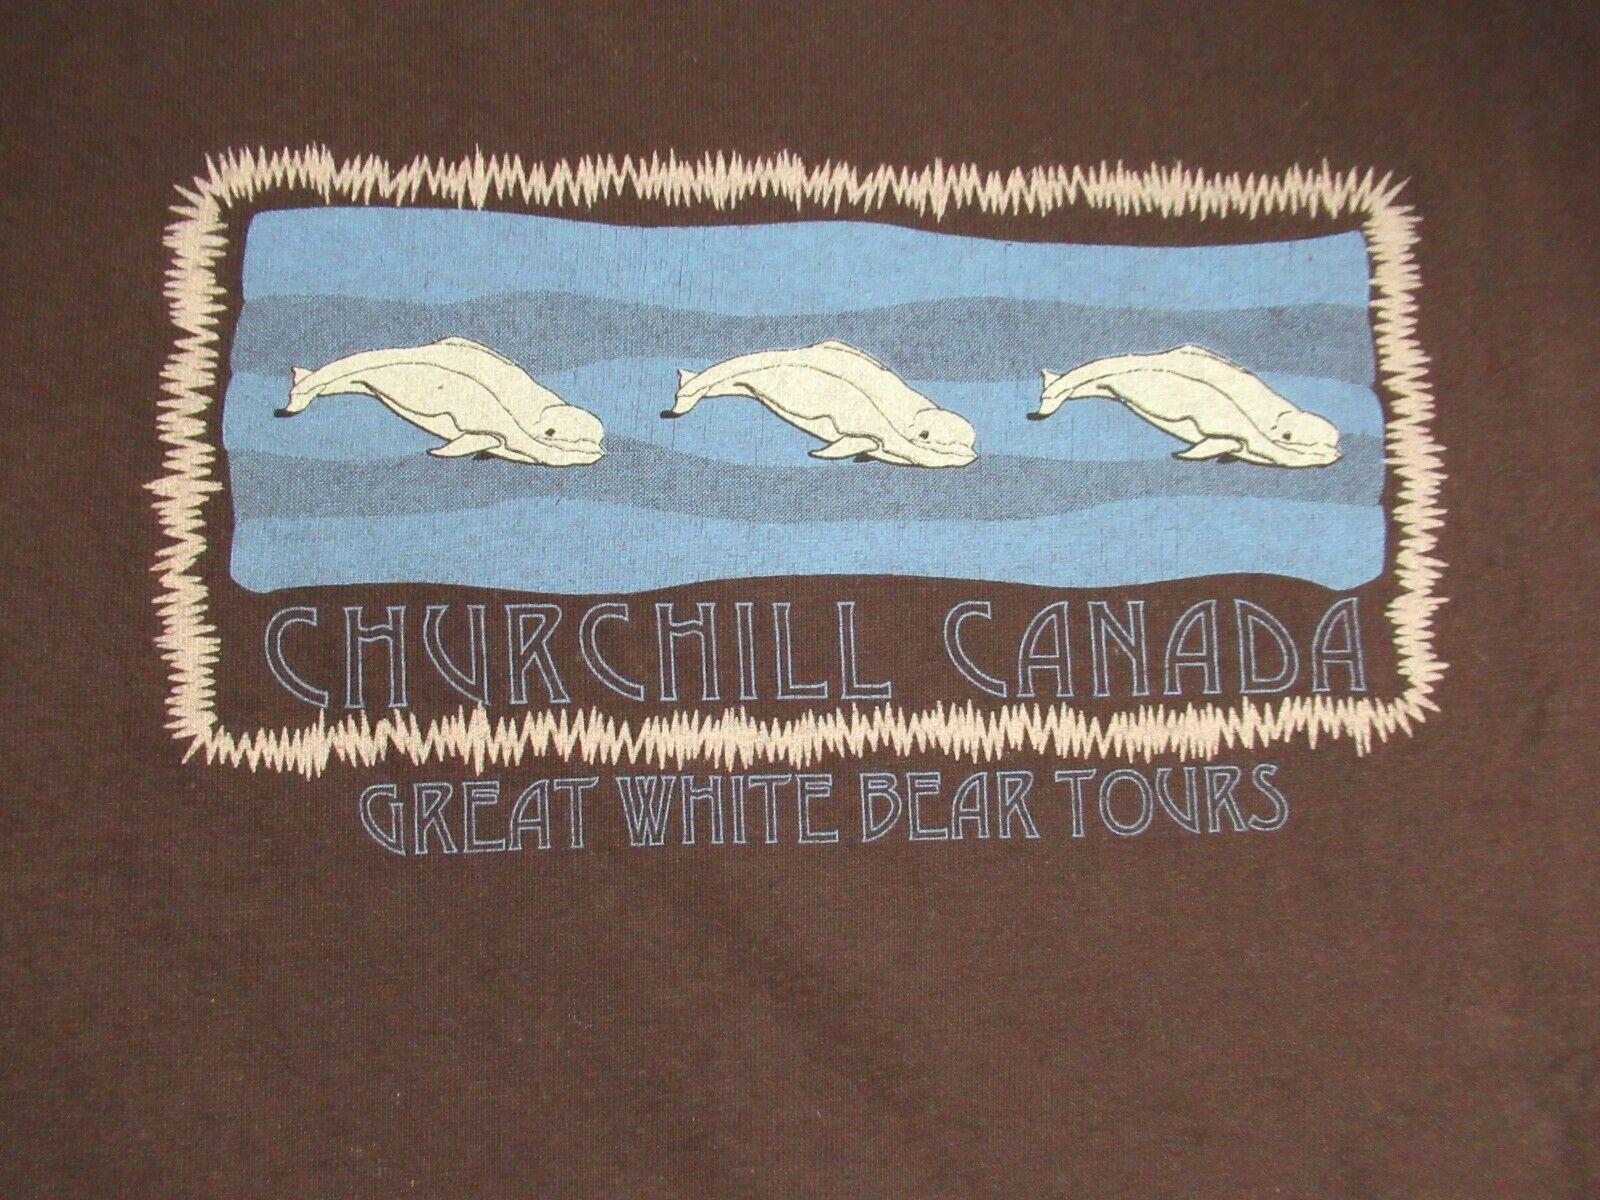 CHURCHILL CANADA - GREAT WHITE BEAR TOURS - BROWN XL T-SHIRT F1283